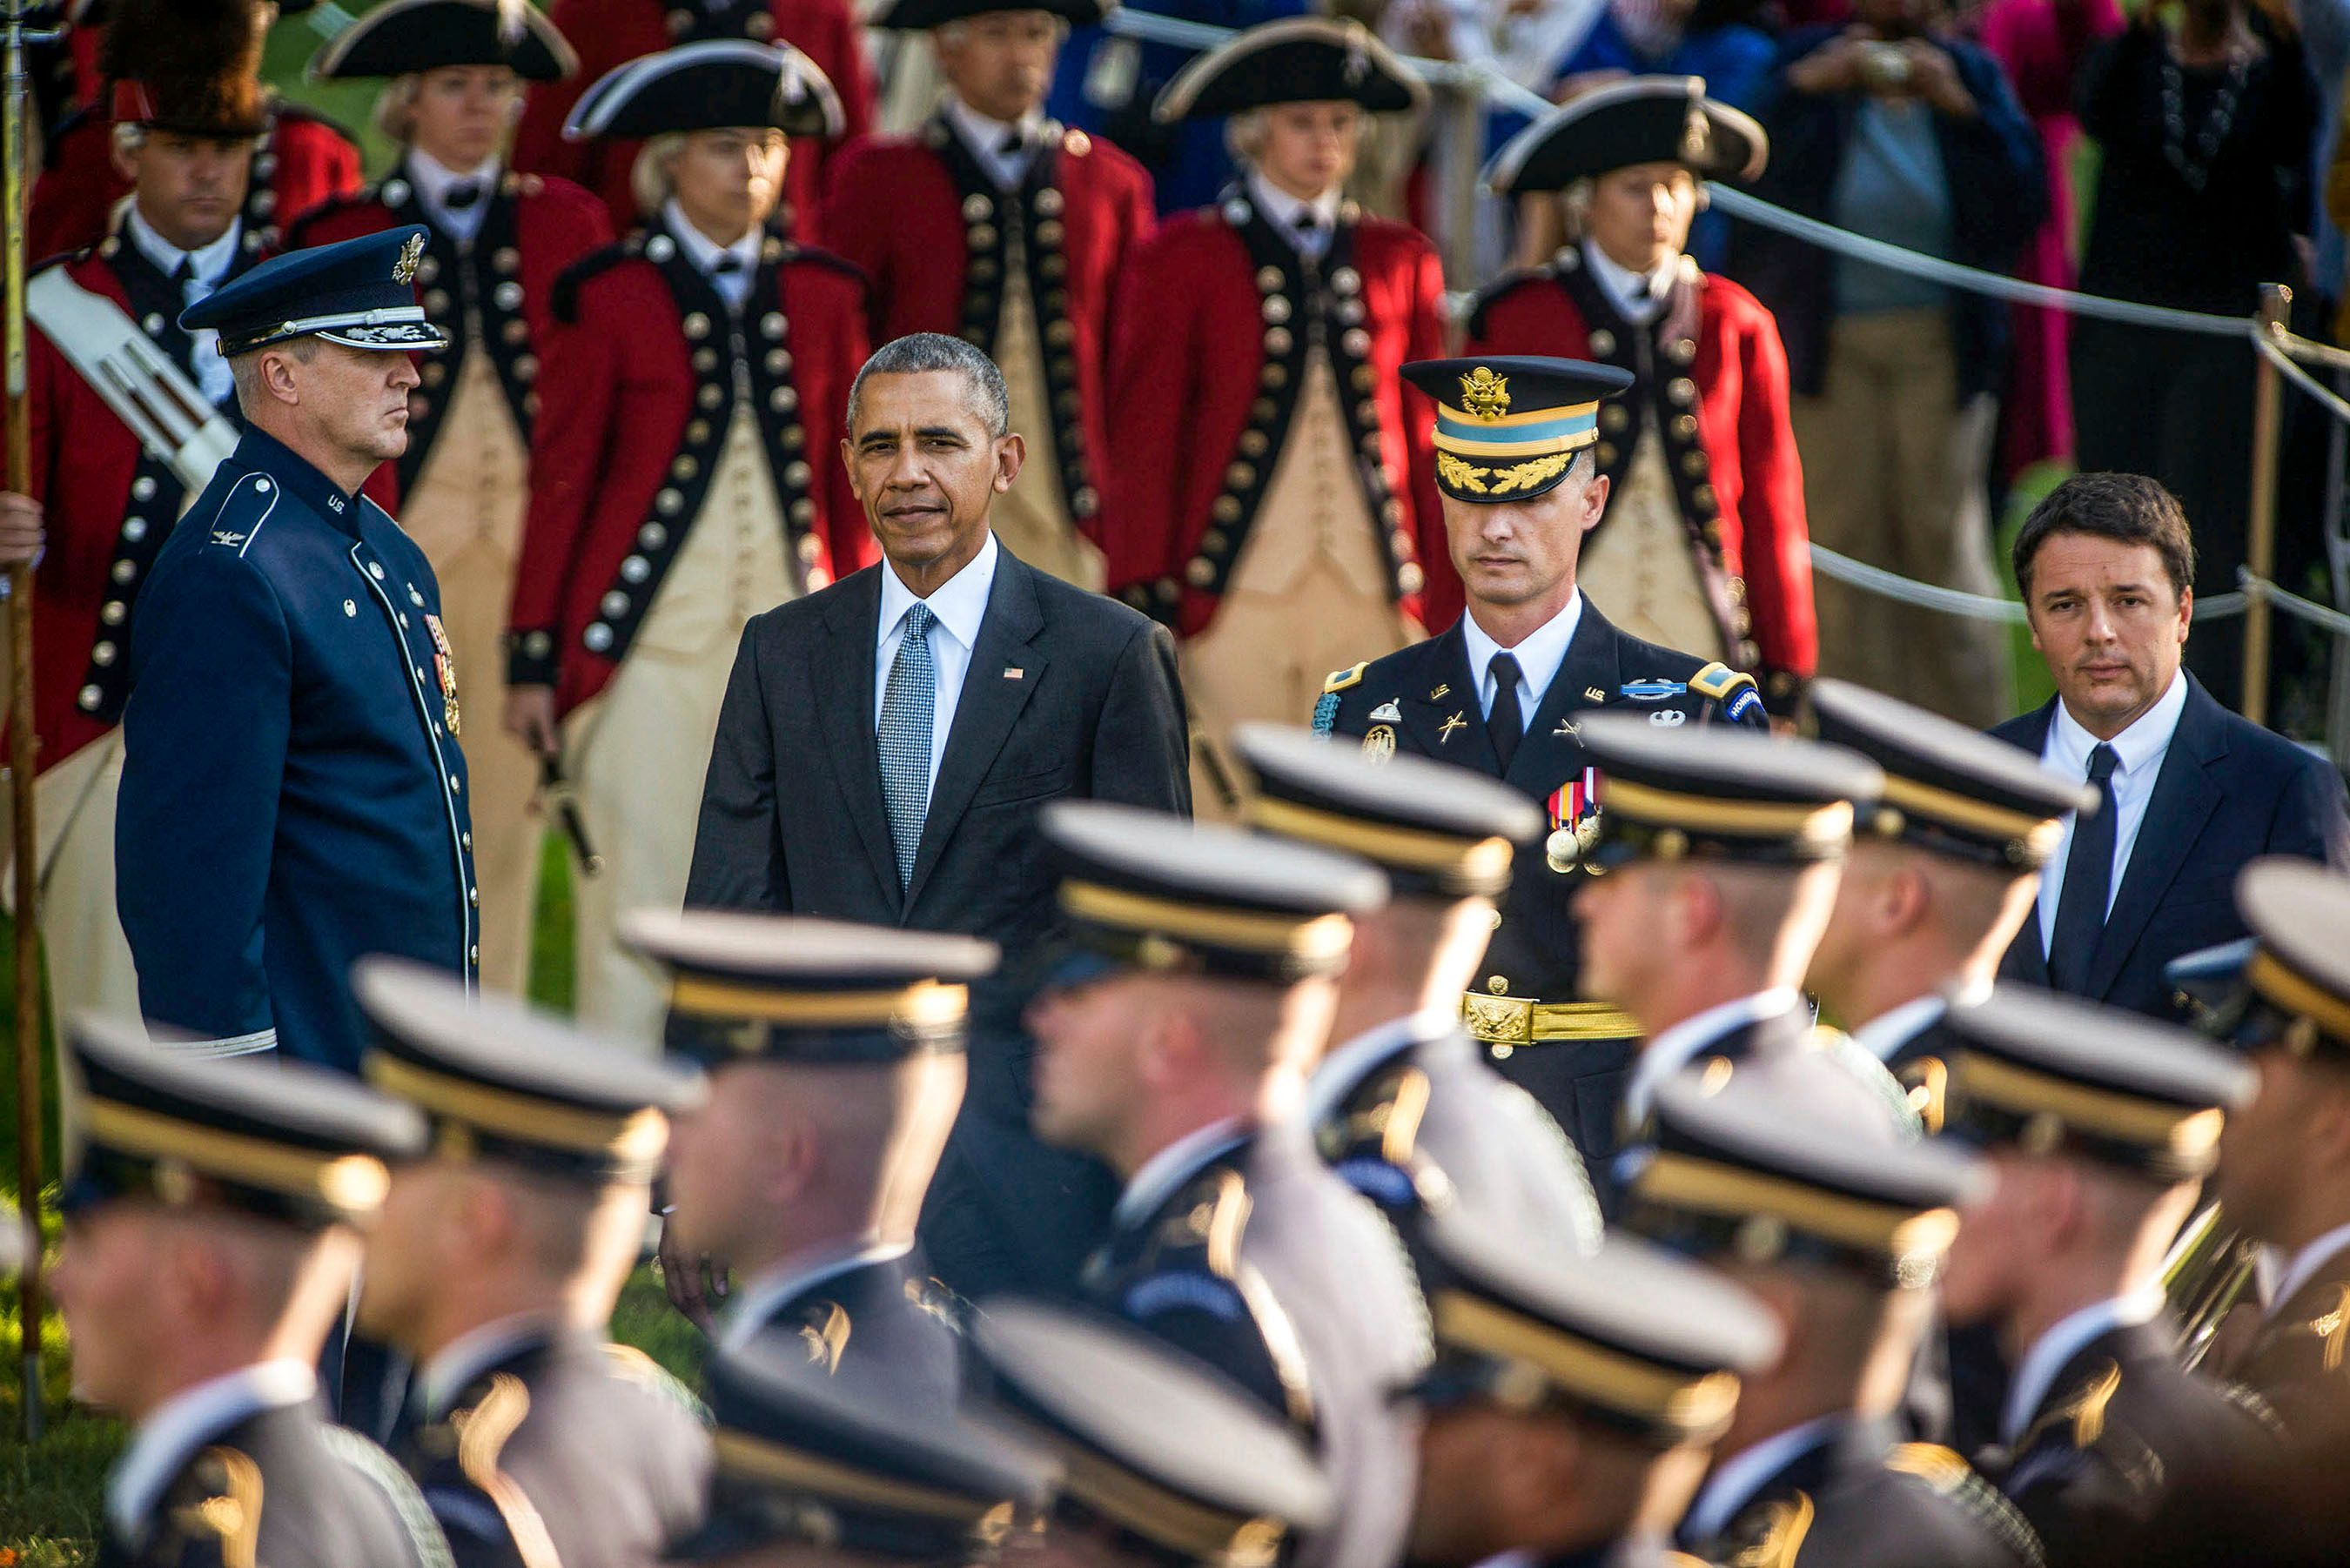 ObamaRenziMilitaryWeb.jpg